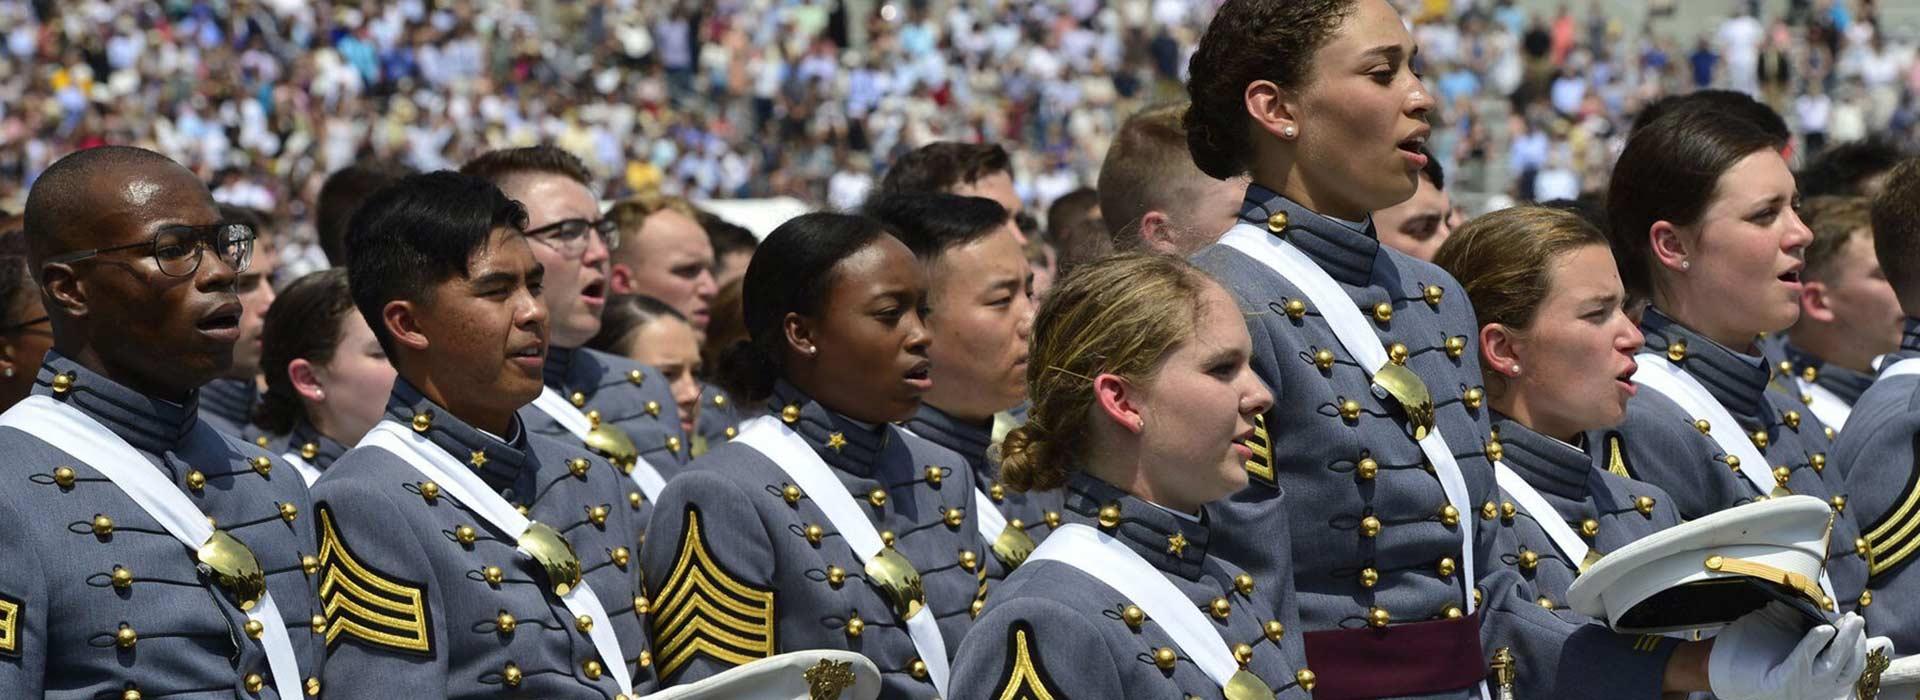 Military academy ceremony